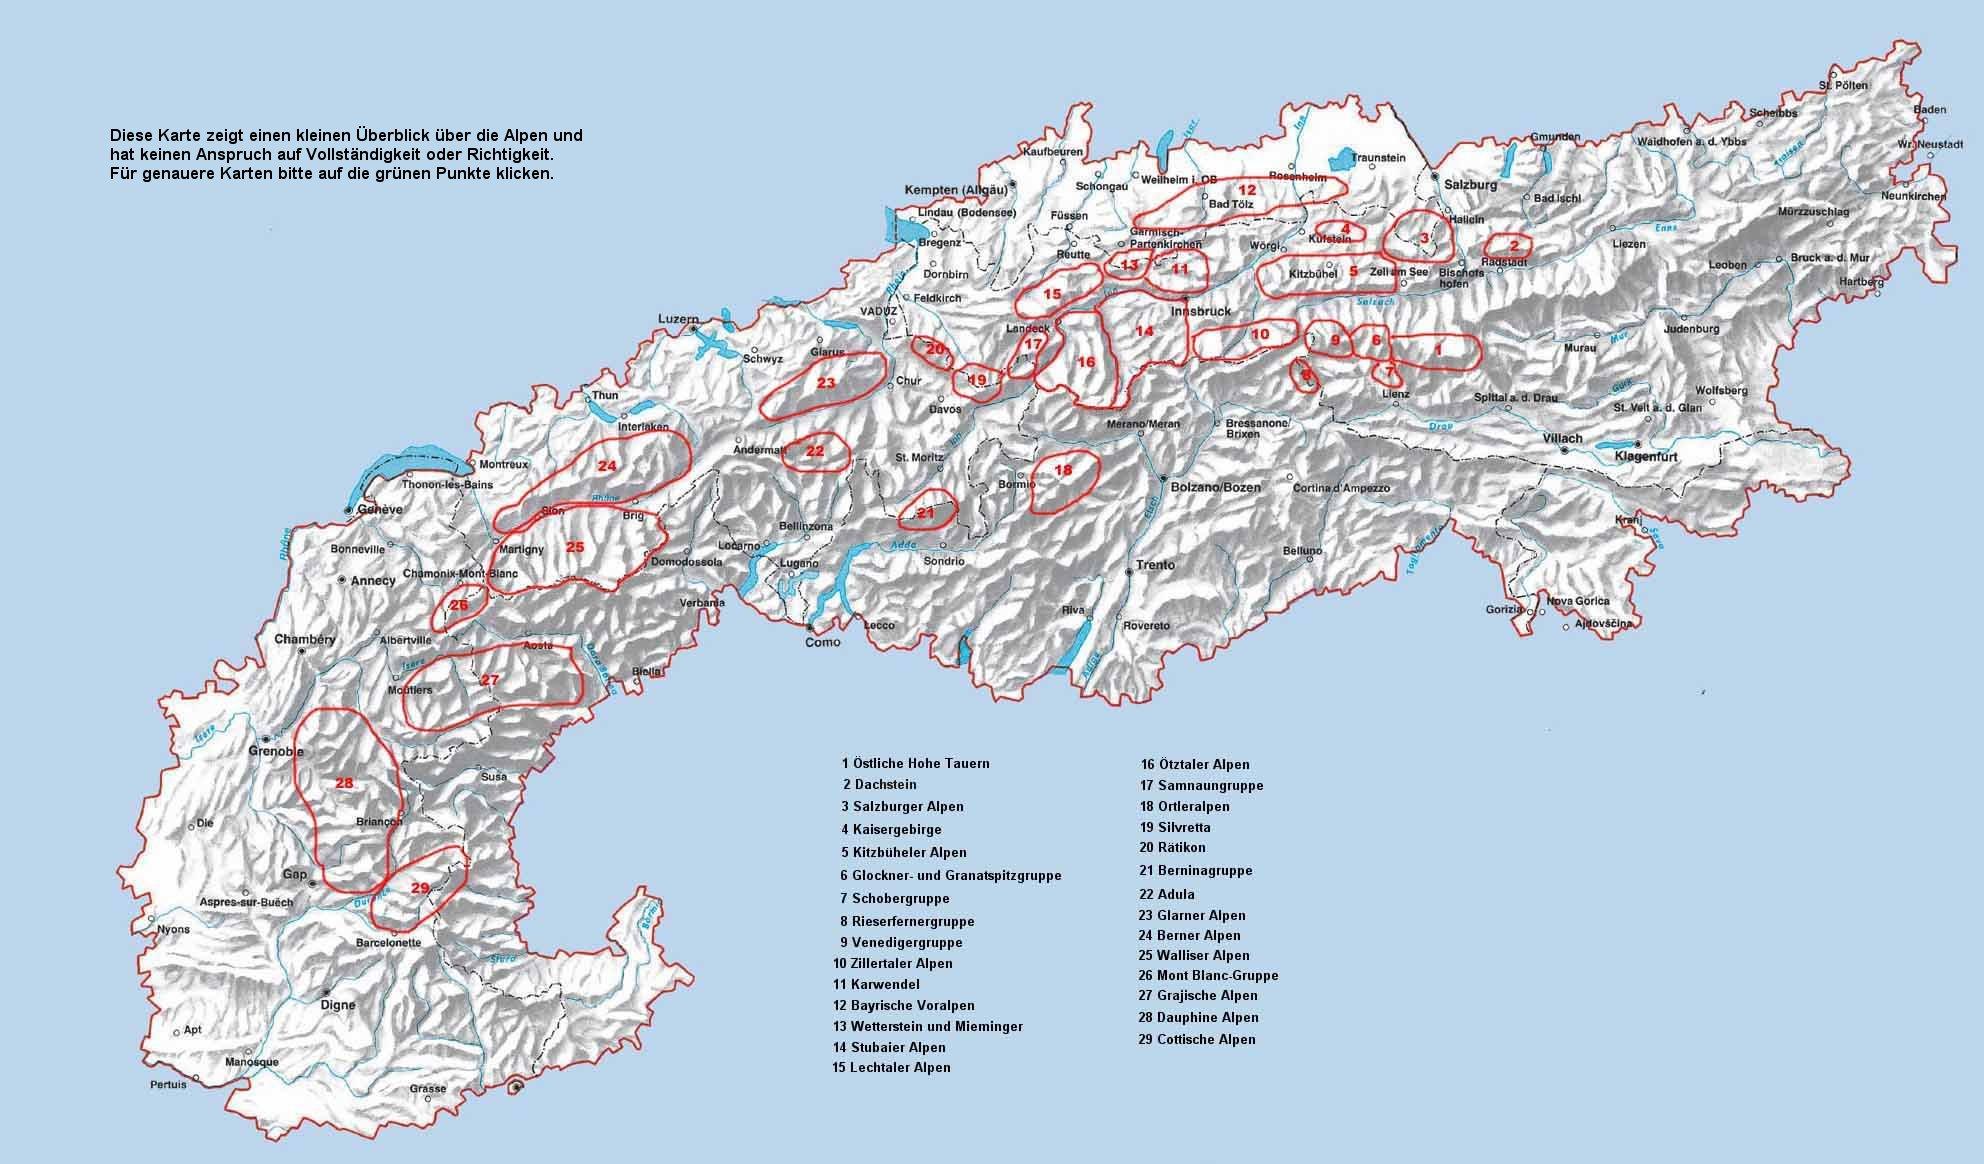 Wanderwege Deutschland Karte.Bericht